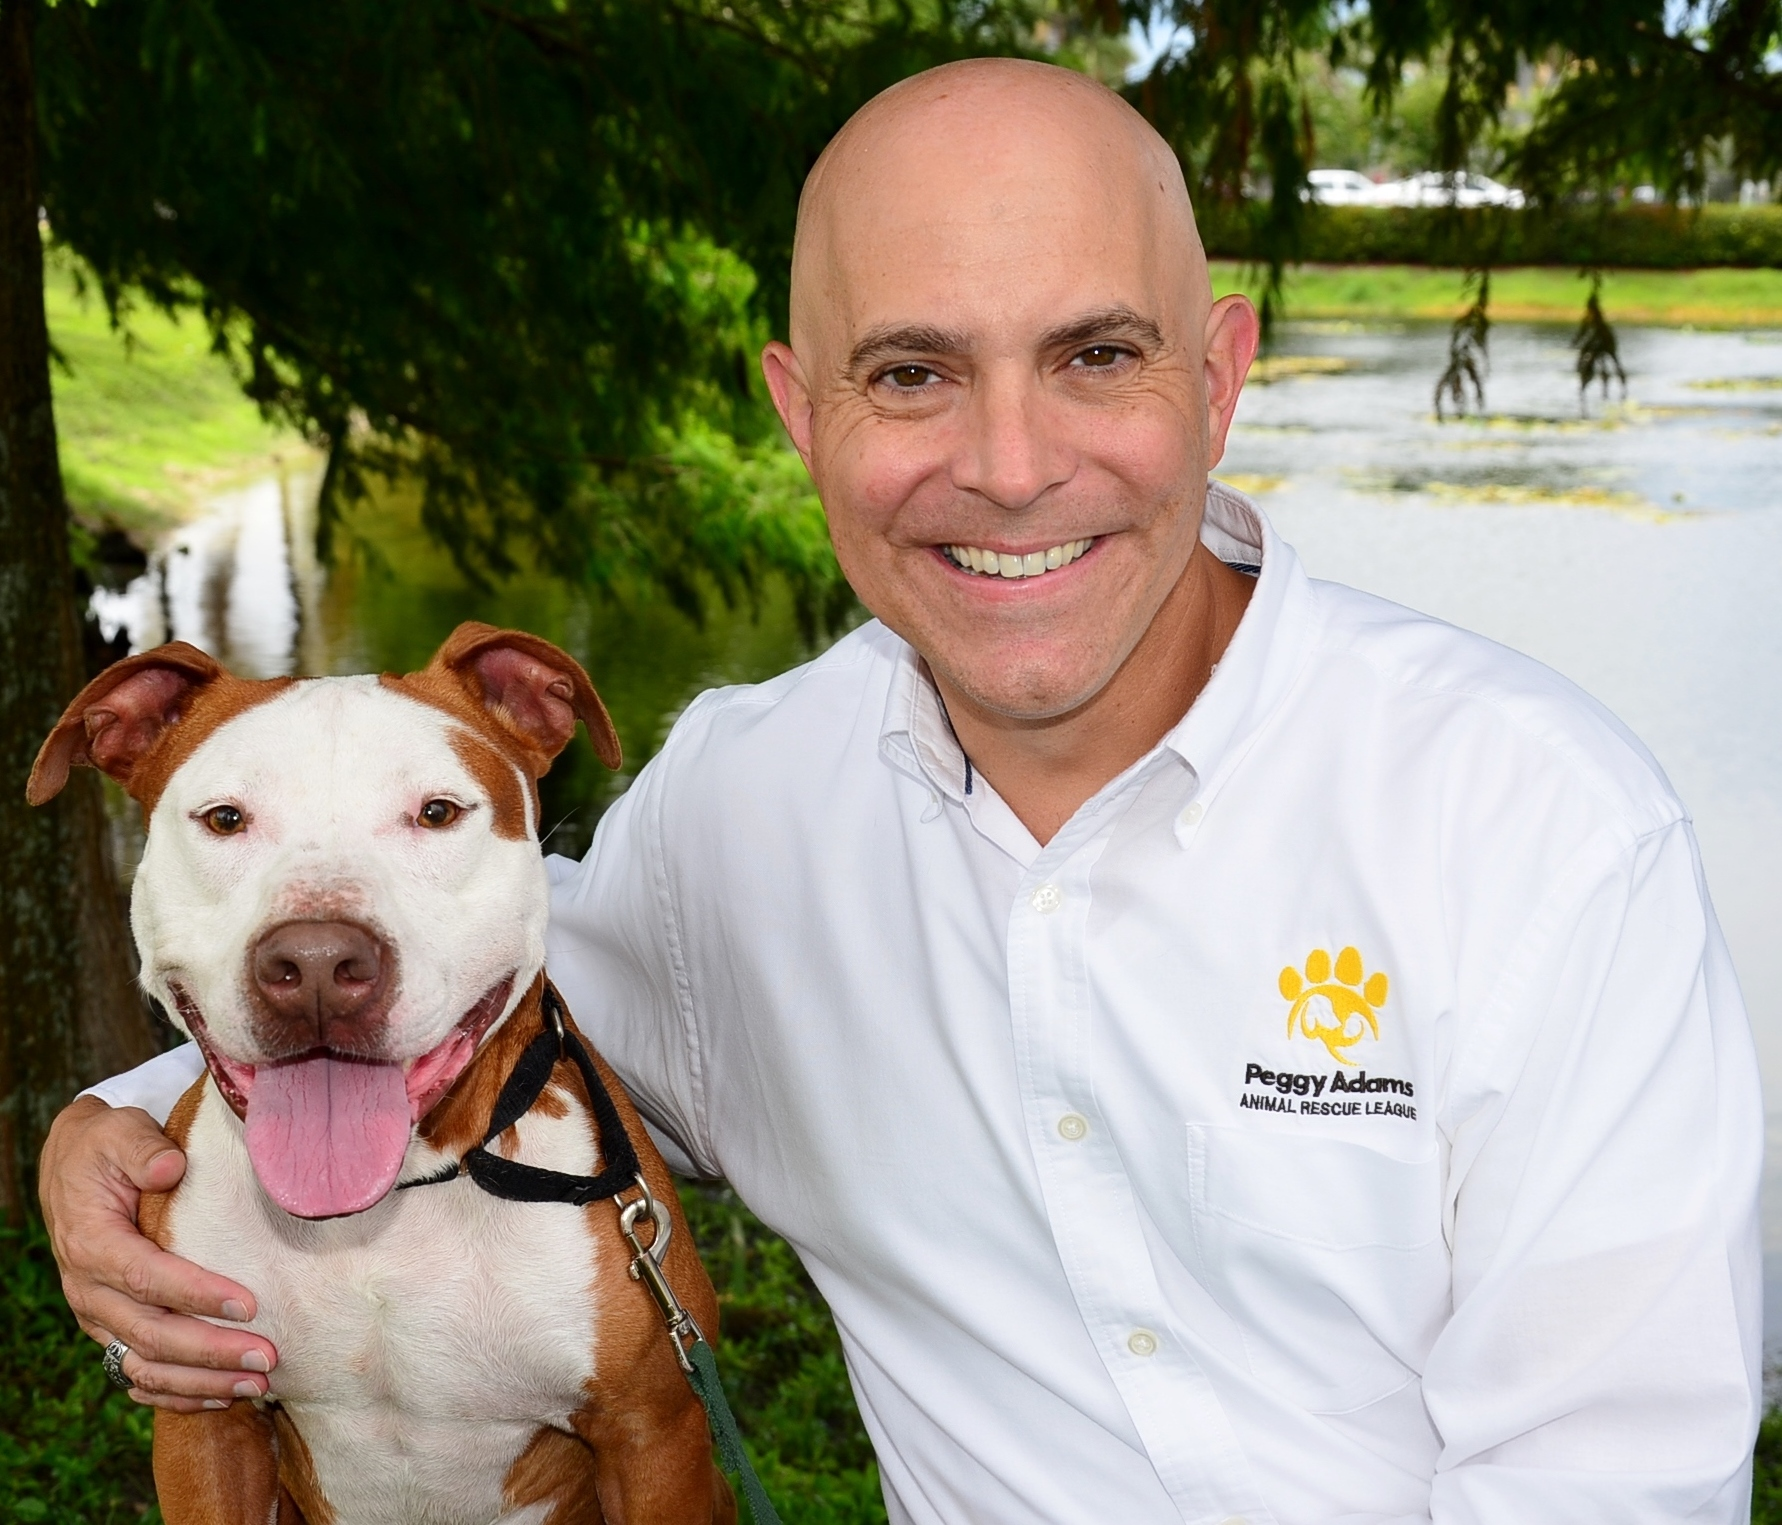 Peggy Adams Animal Rescue League 3100 3200 N Military Trl